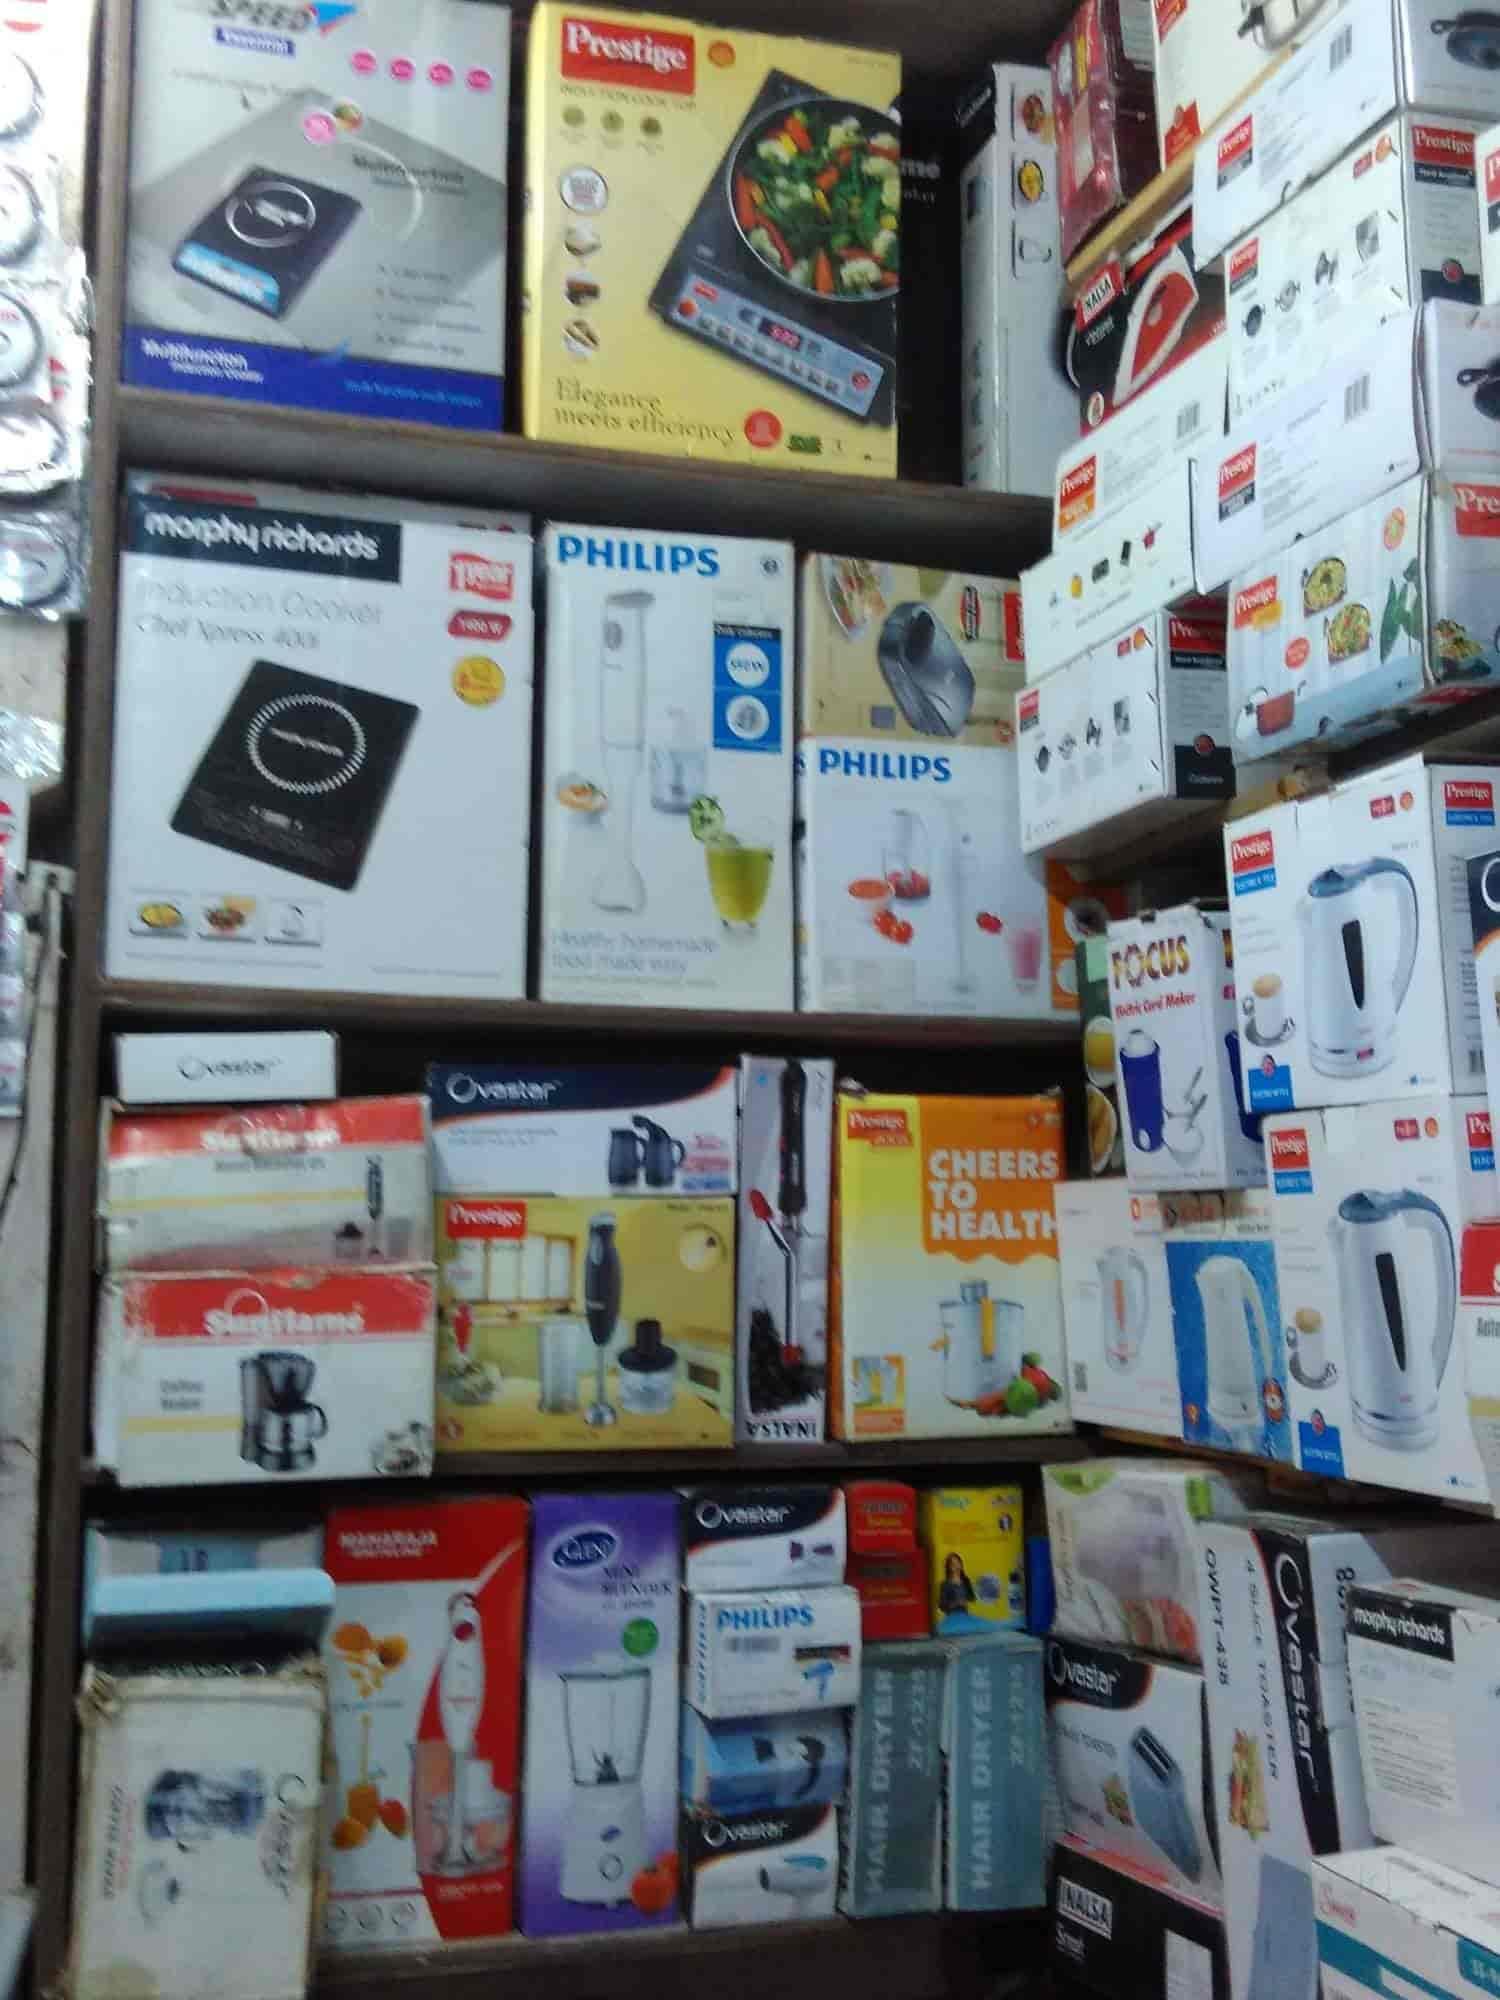 Kitchen Craft Photos, Dwarka Sector 10, Delhi-NCR- Pictures & Images ...